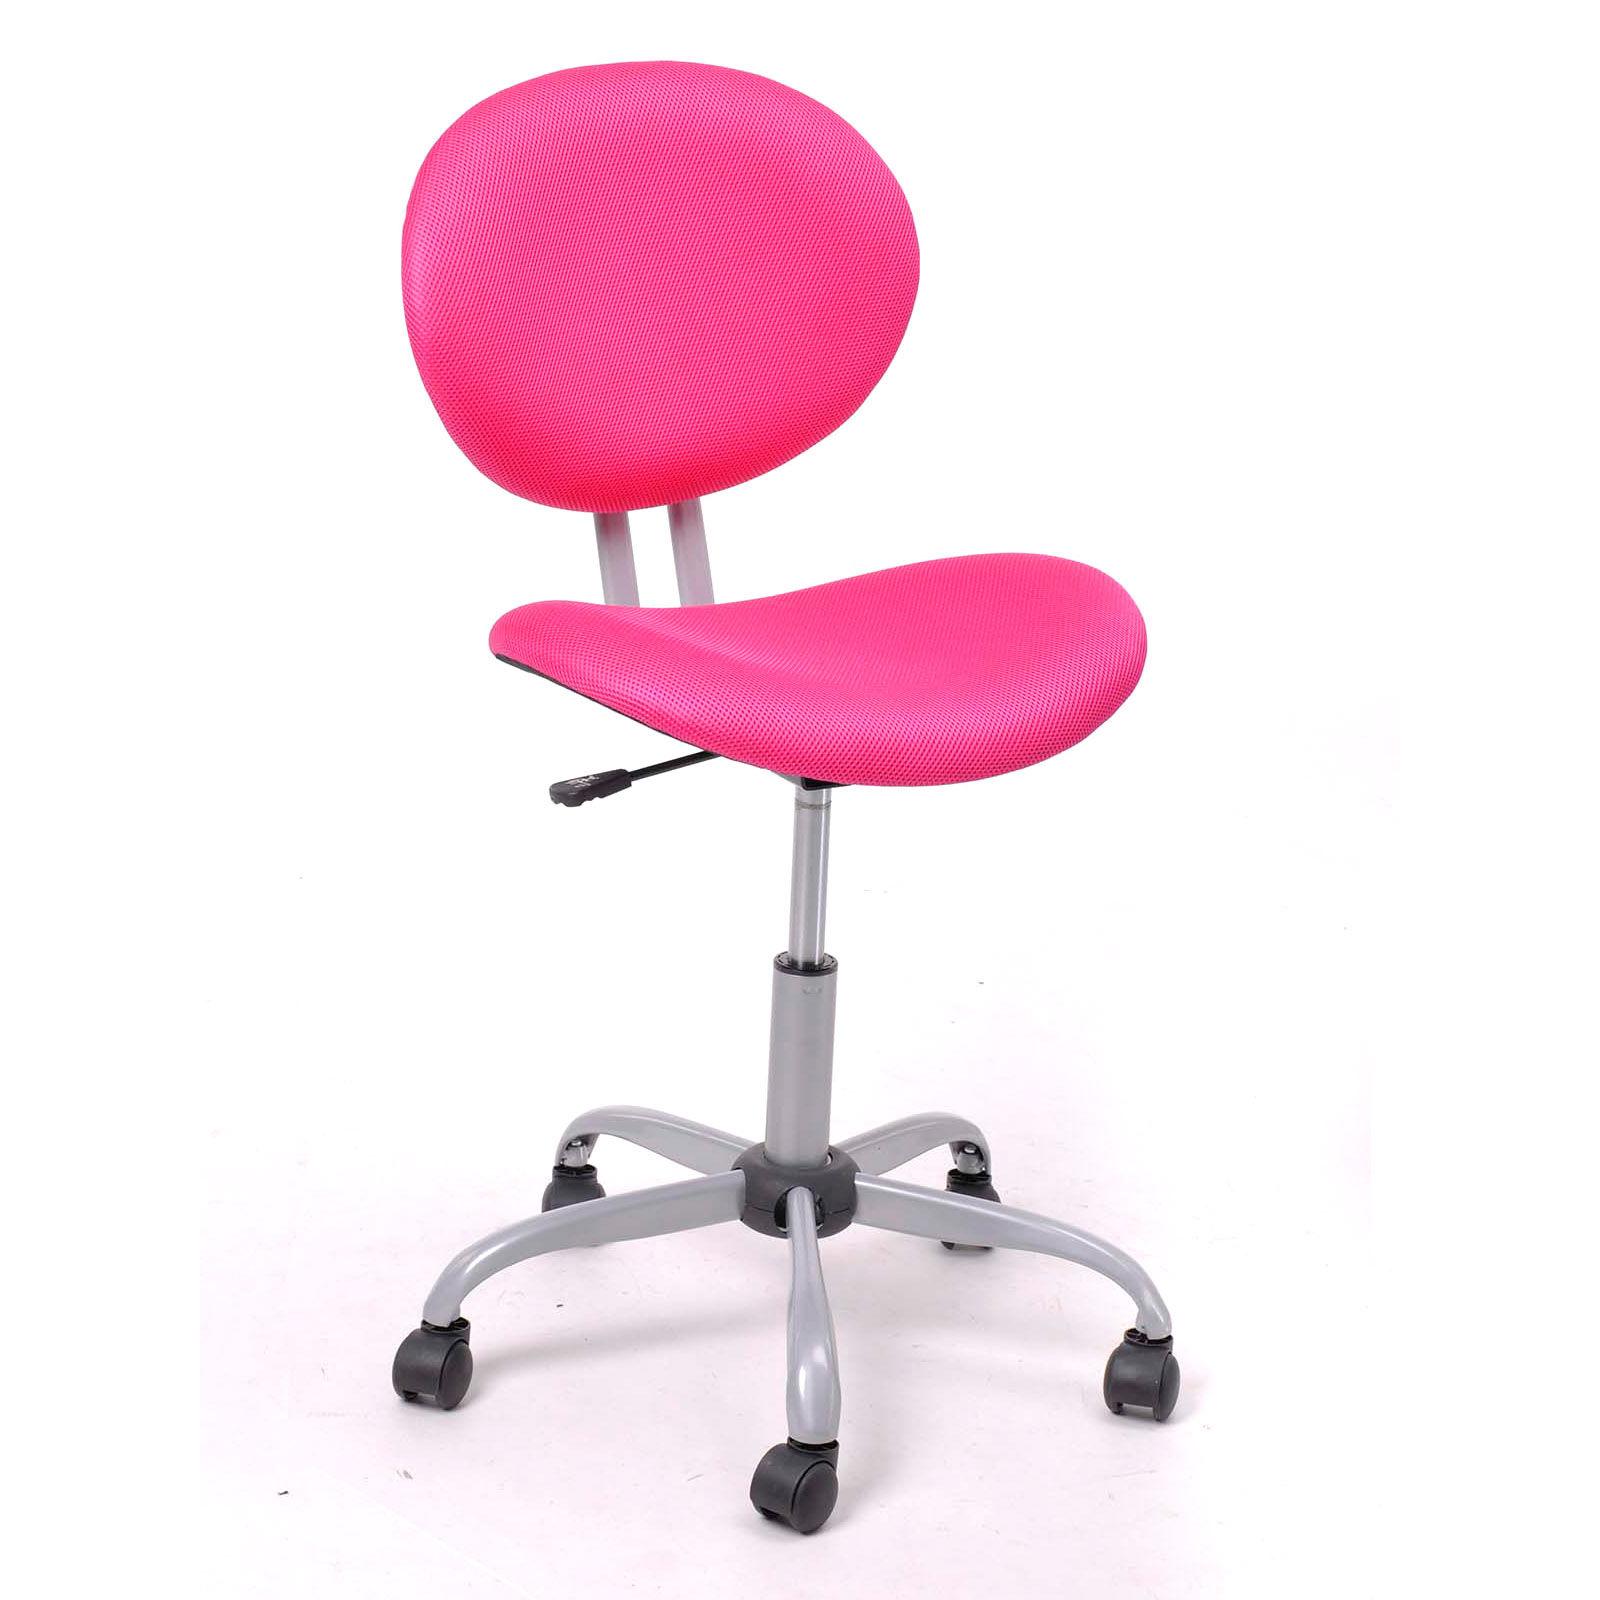 Pink Ergonomic Mesh puter fice Chair Desk Midback Kid Student